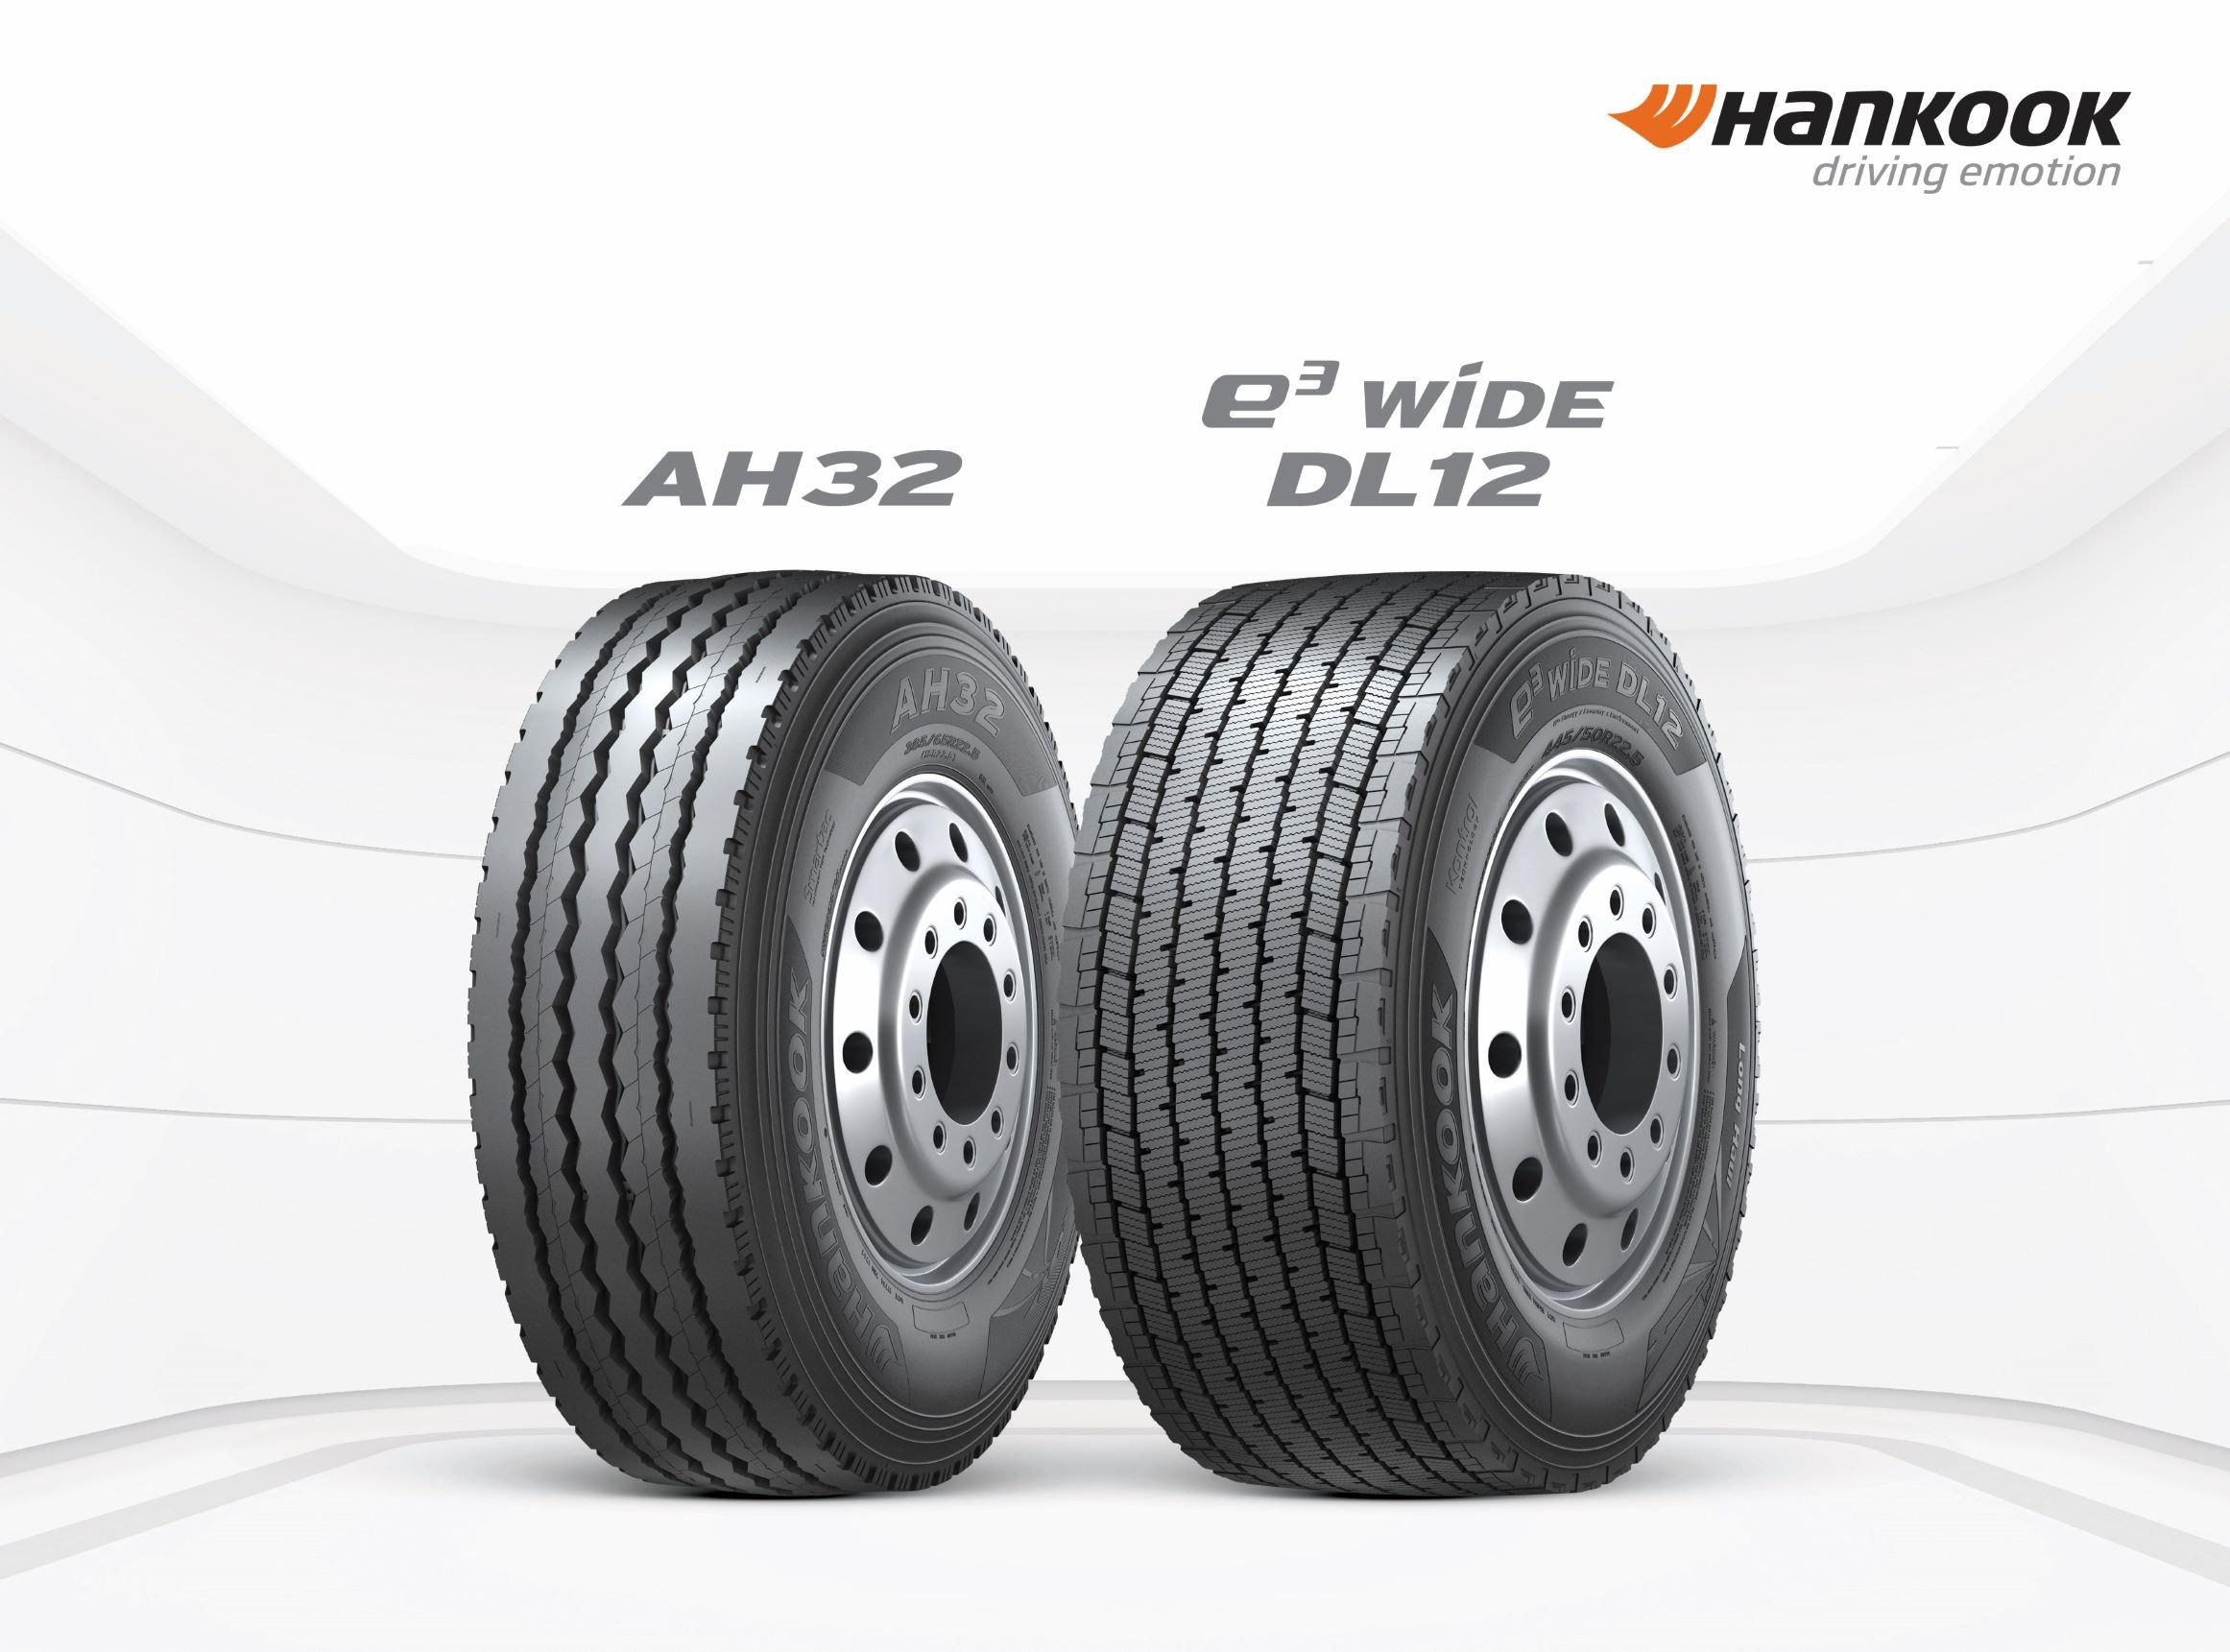 Hankook Has 2 New Wide-Base Tires